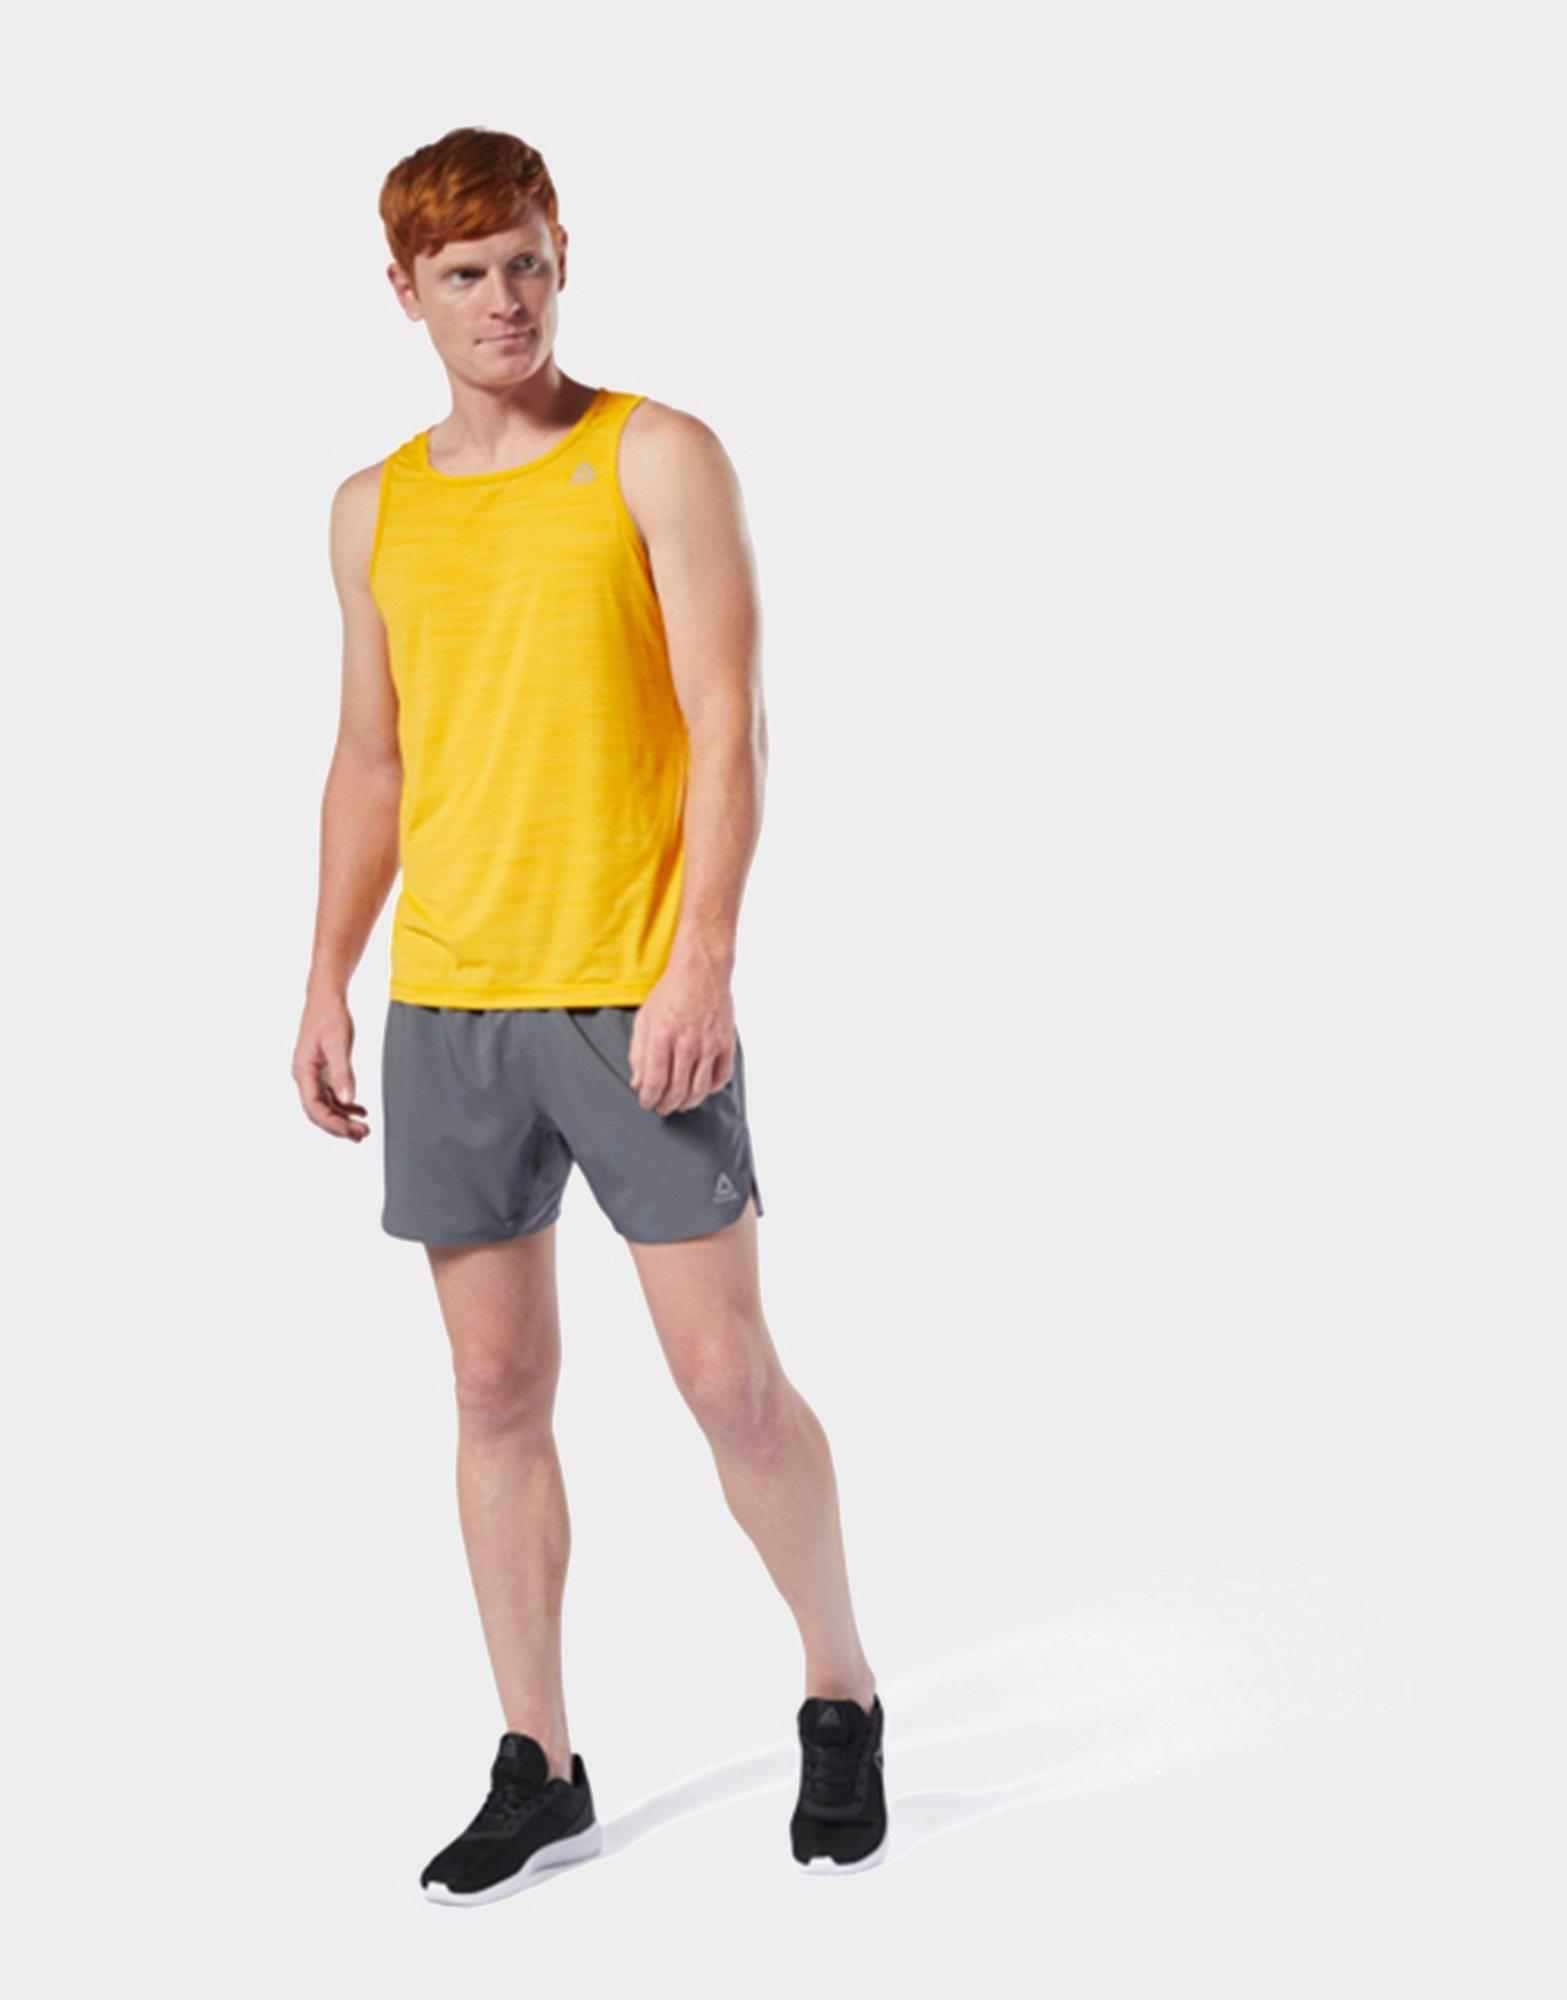 Lyst Reebok Run Essentials 5 inch Shorts in Gray for Men